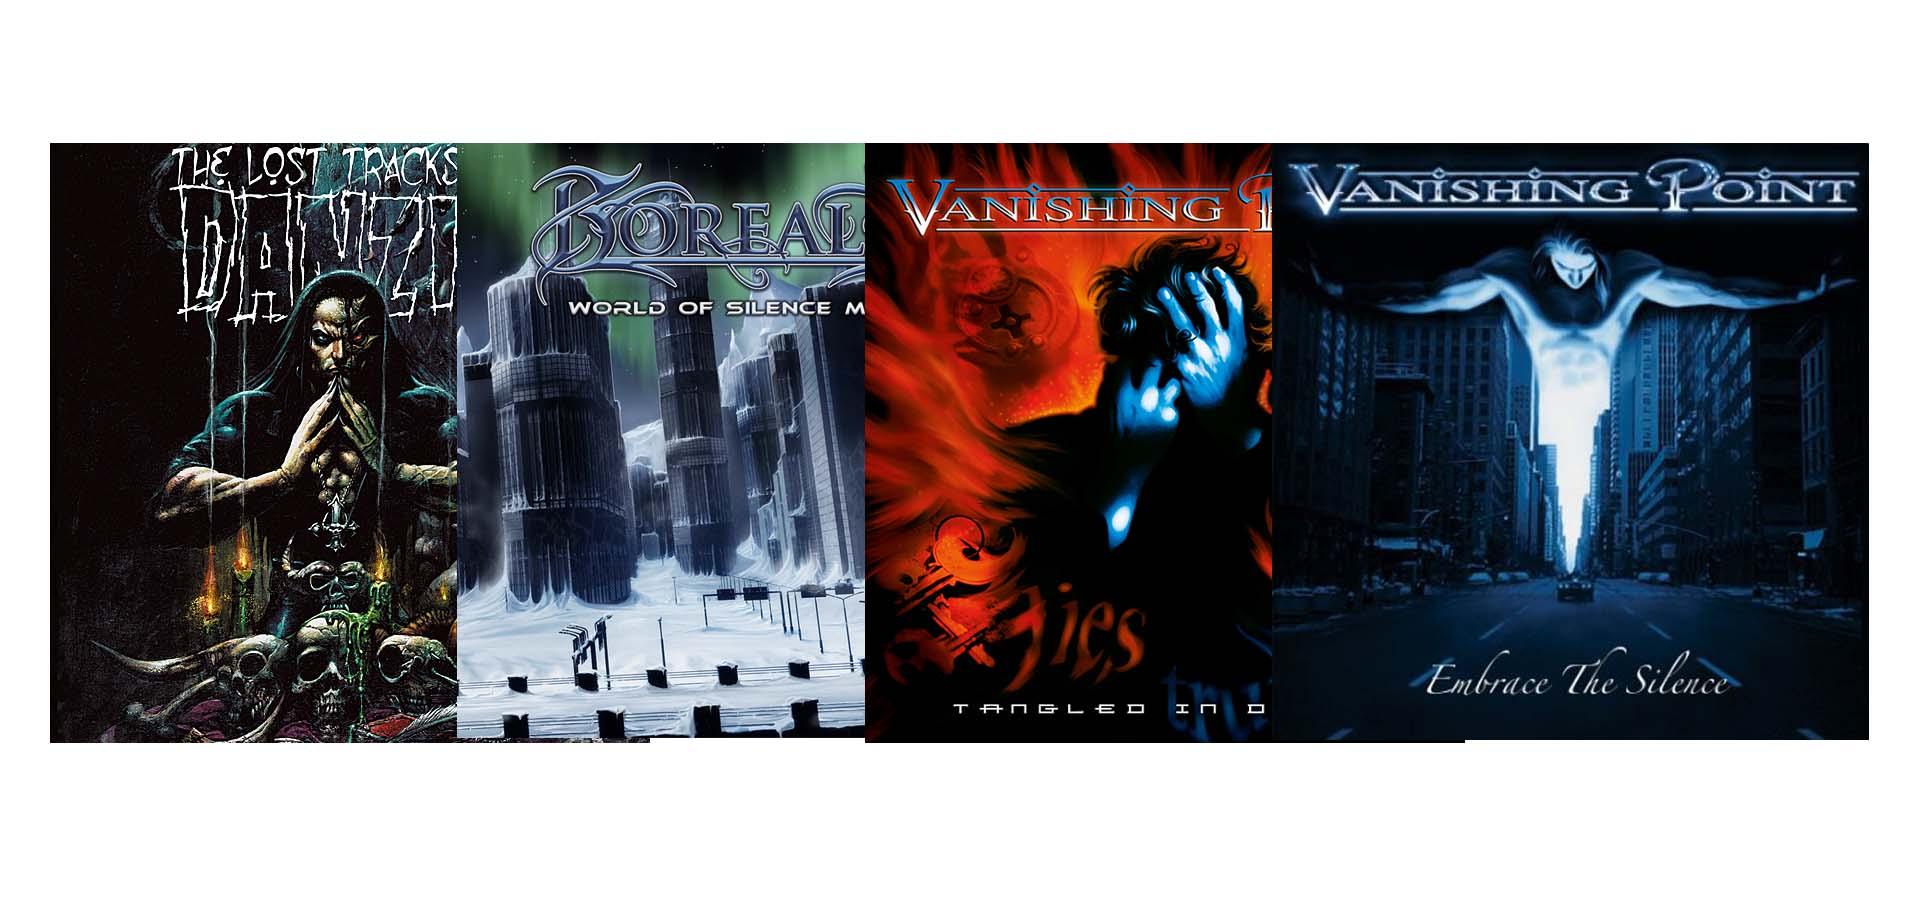 RE-RELEASES - Vanishing Point, Borealis, Danzig